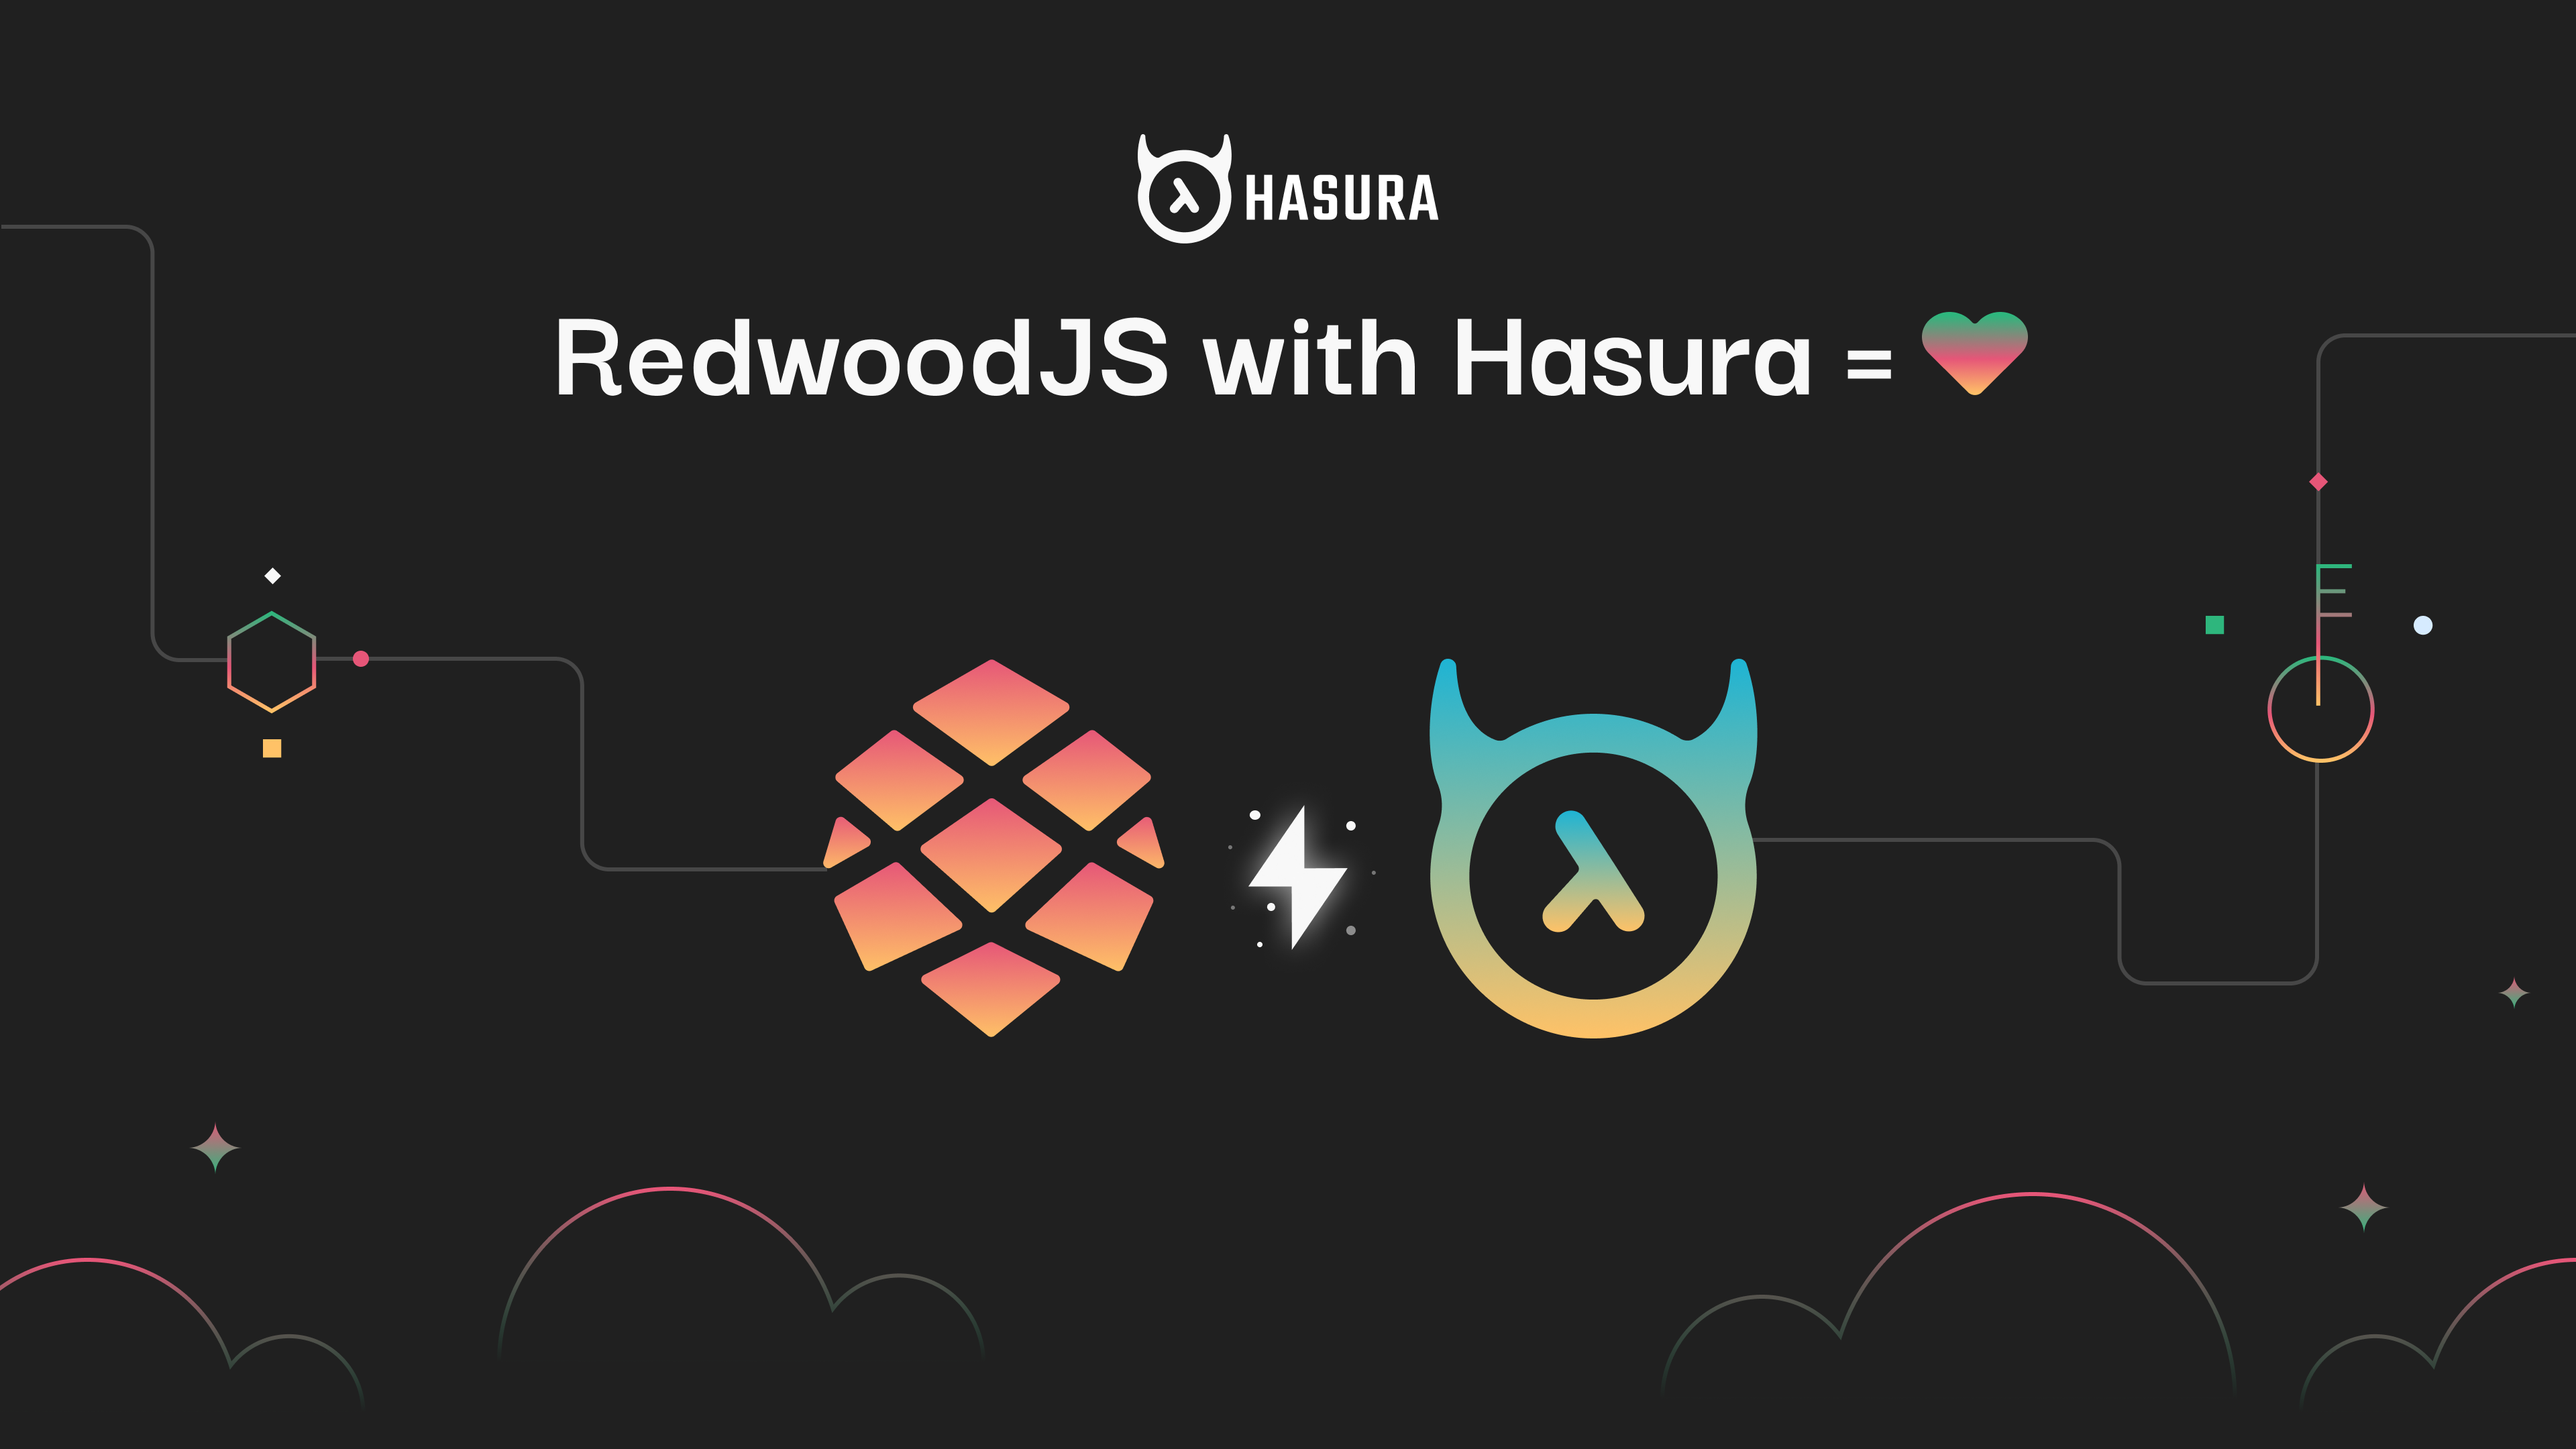 redwoodjs_hasura